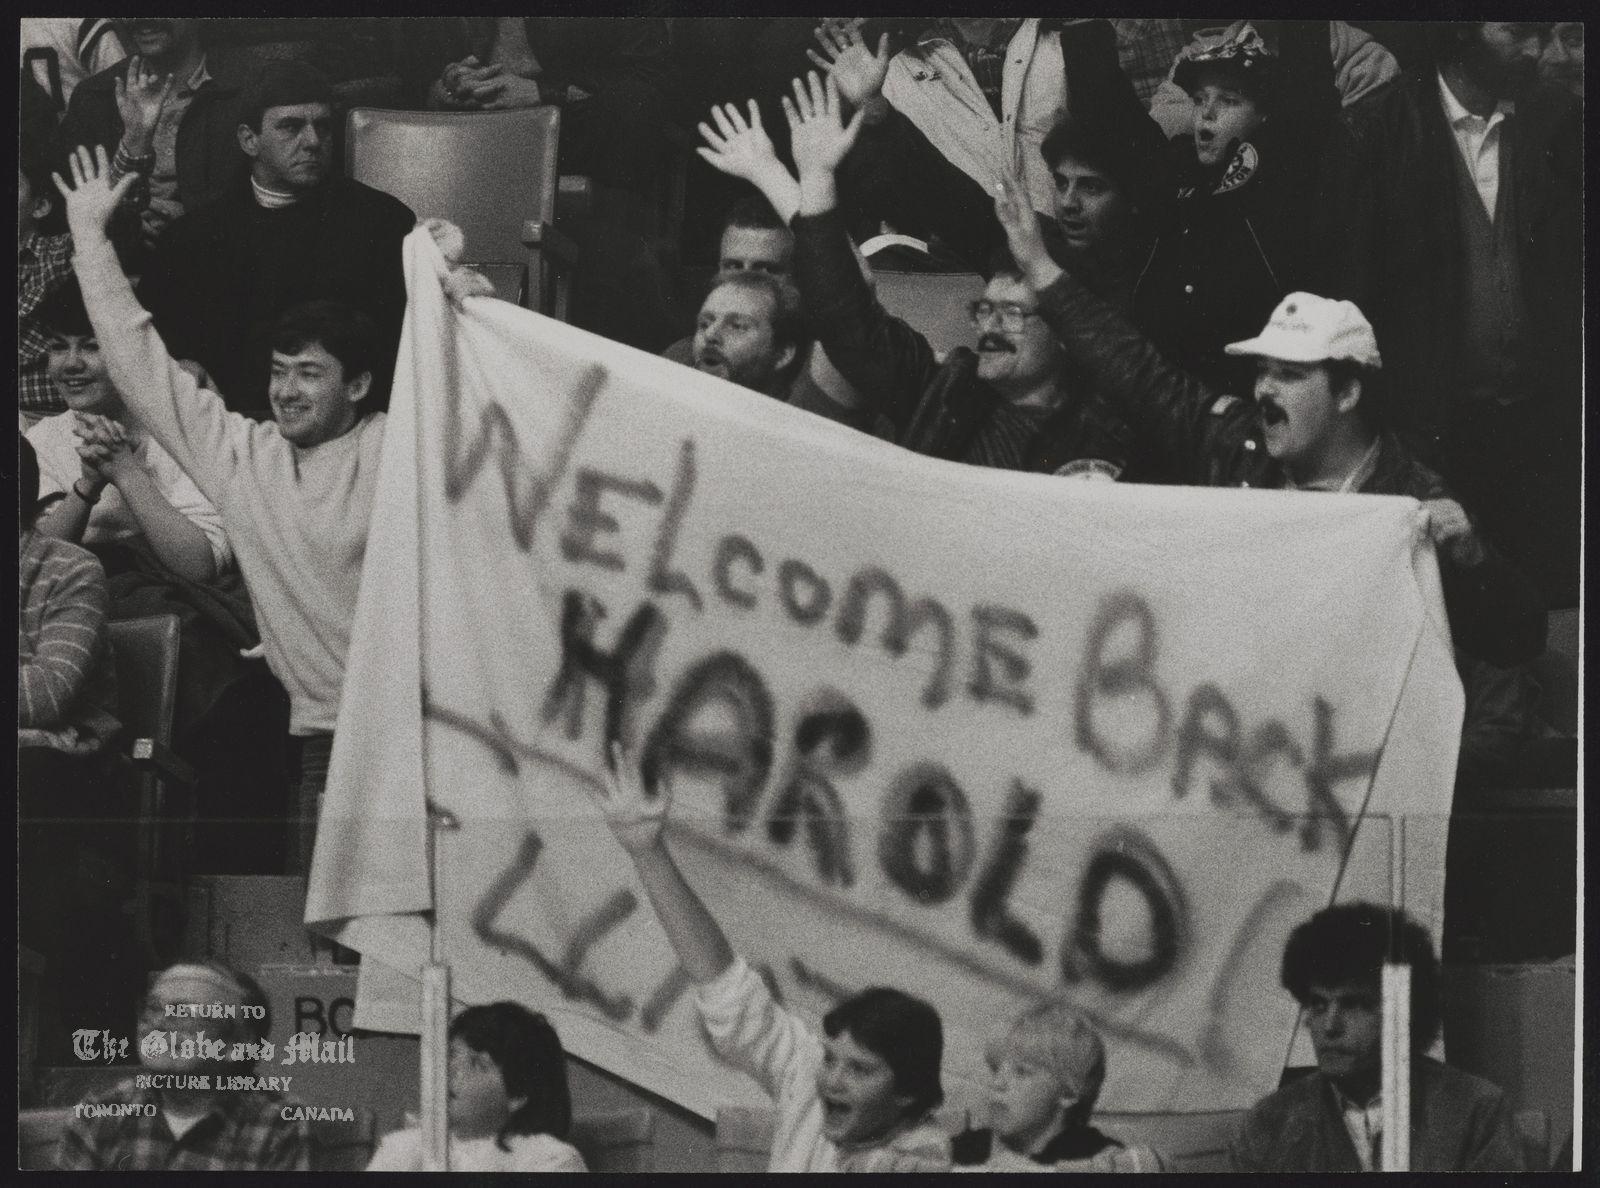 Harold BALLARD Toronto. Businessman Fans salute Leaf boss Harold Ballard, who remains as feisty as ever despite ailments.